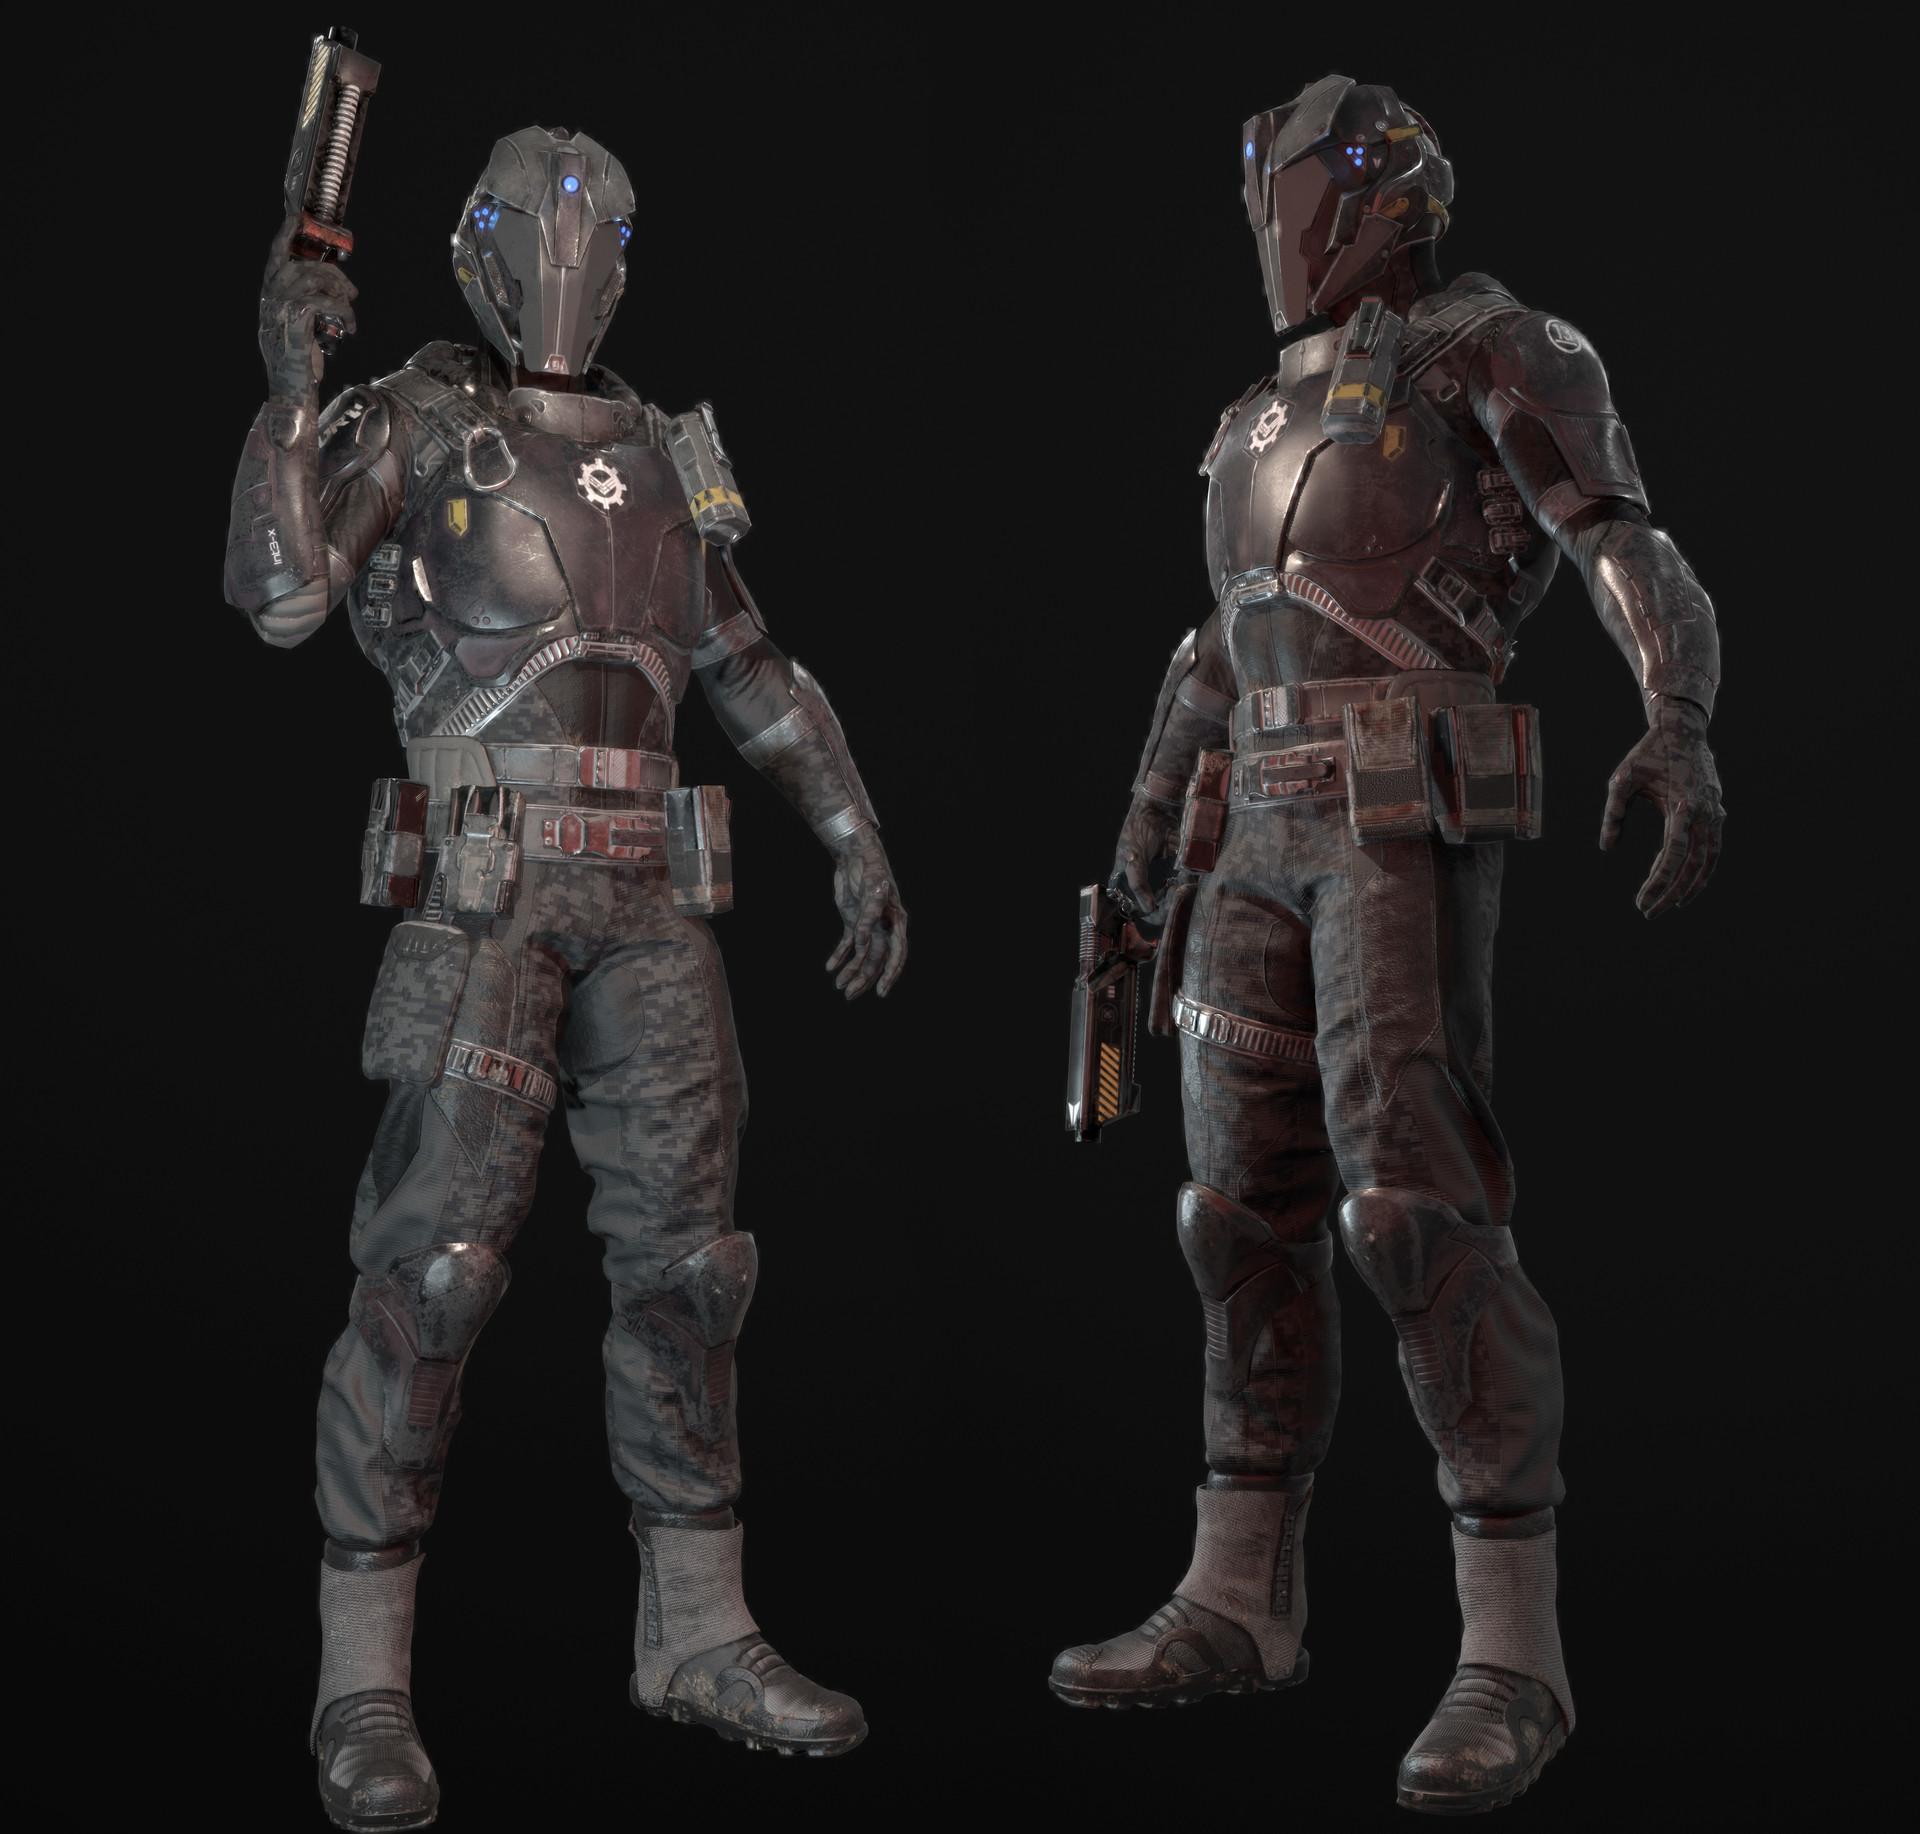 Spyridon boviatsos soldier1